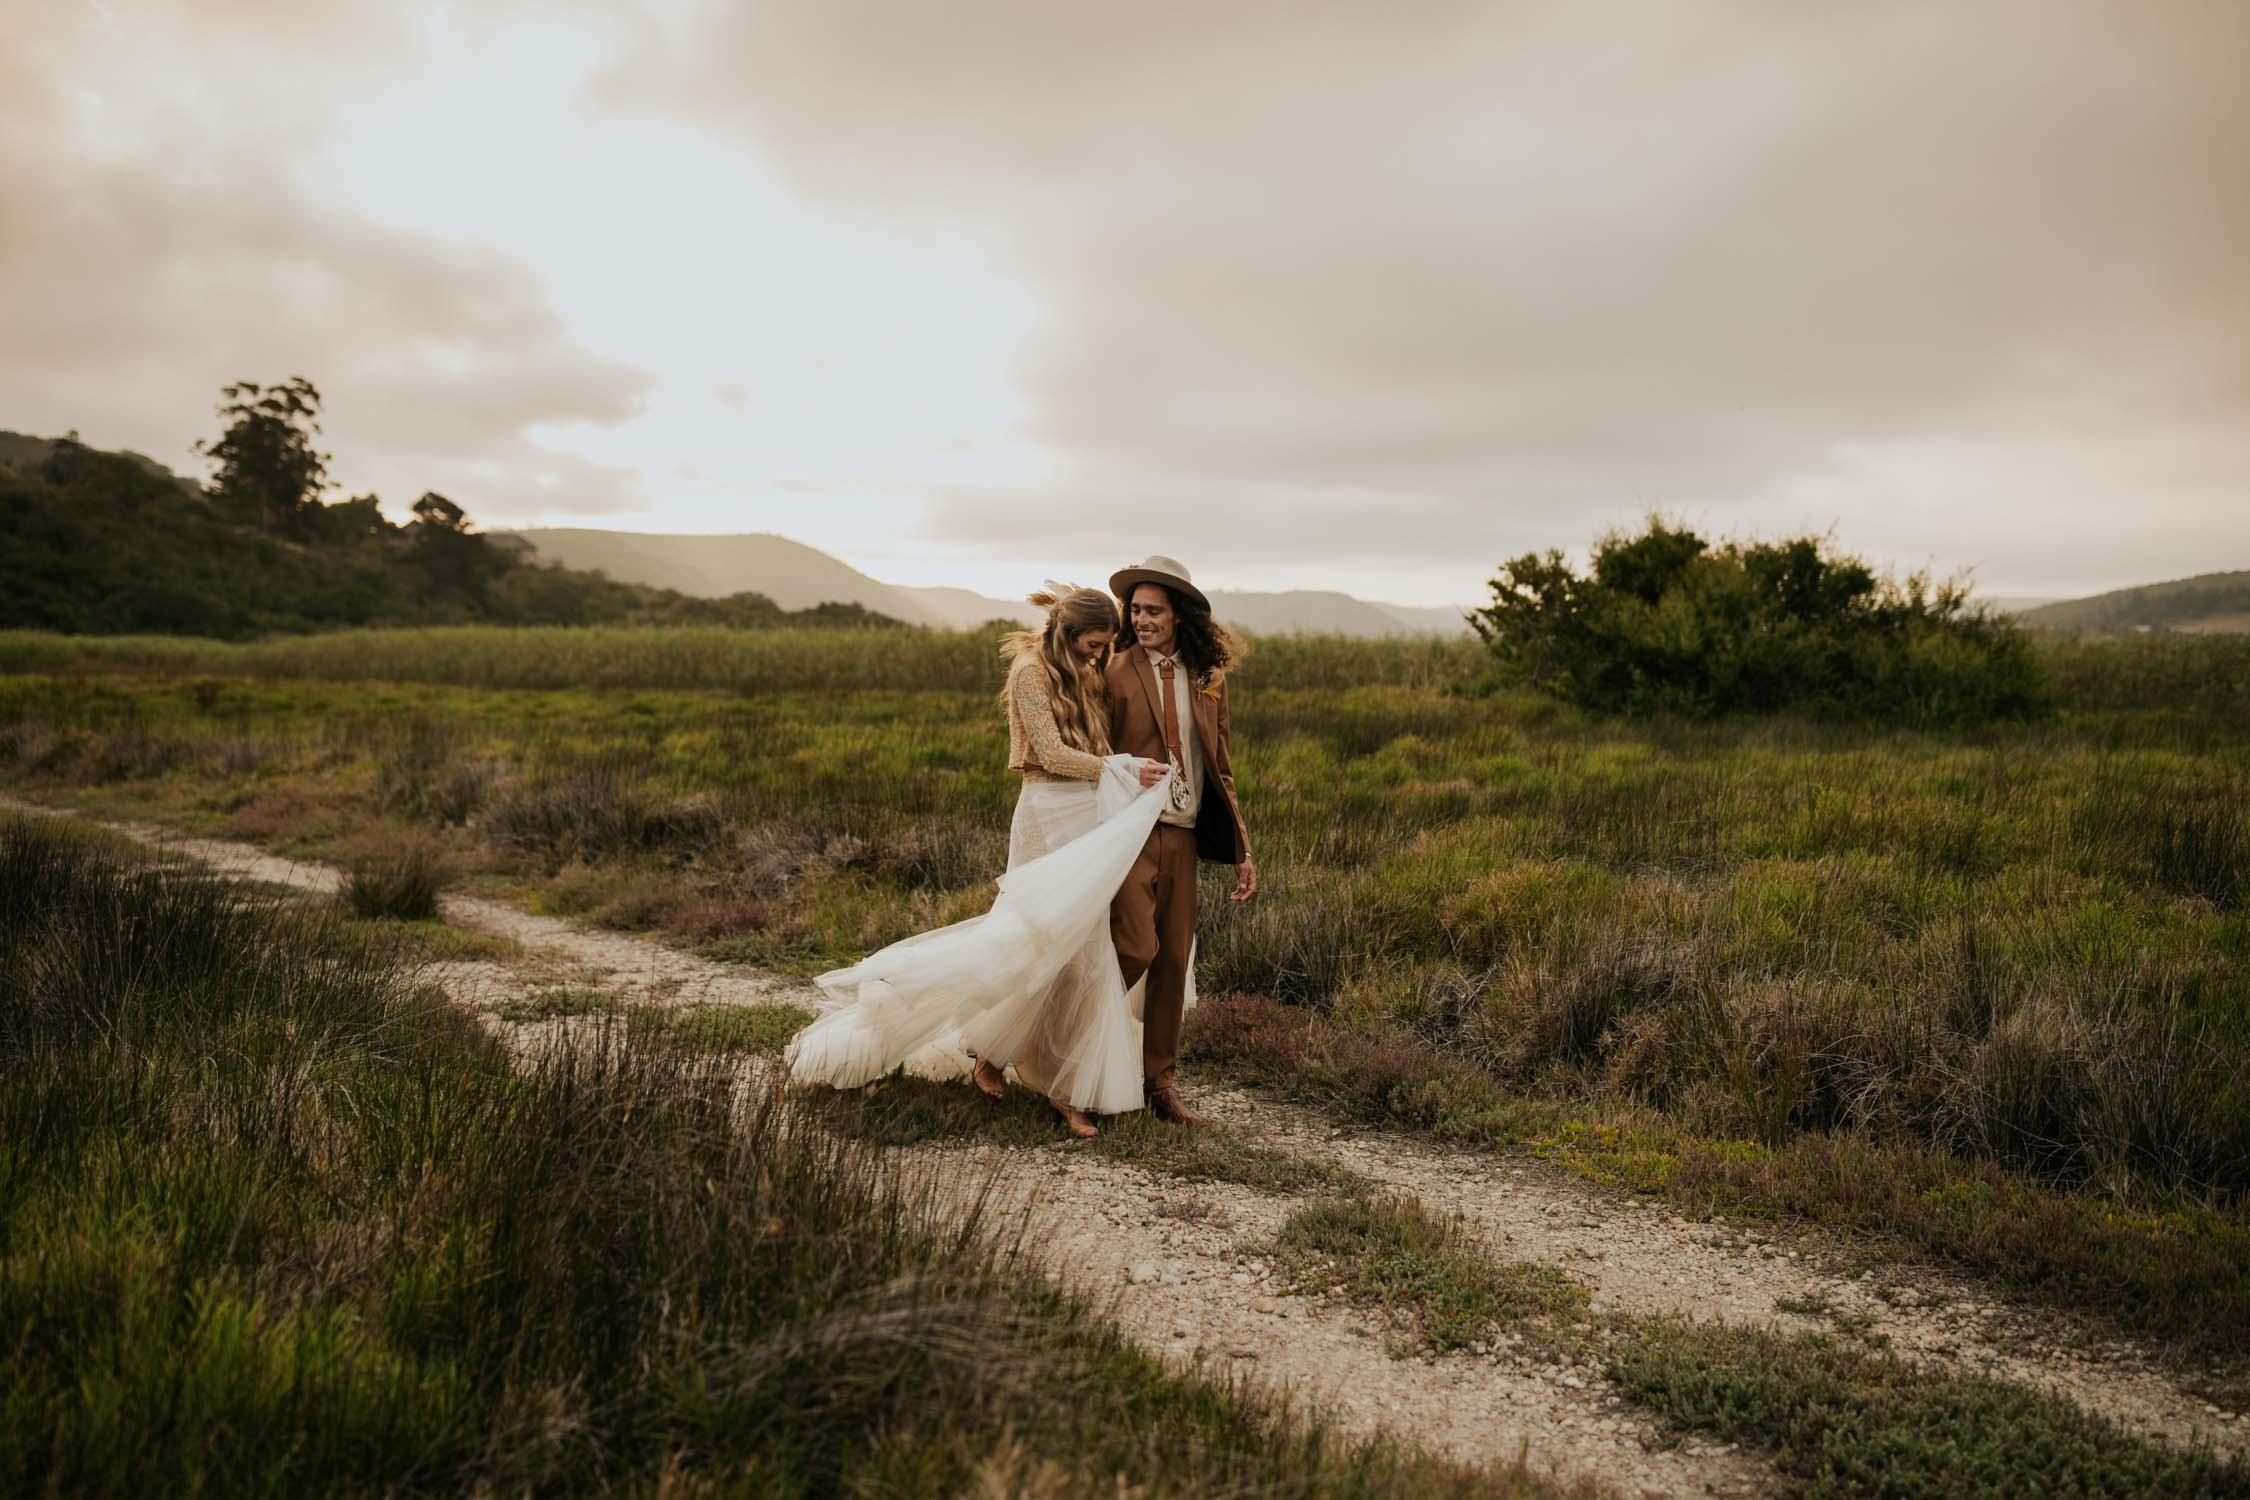 Best Vancouver Wedding Photographer takes amazing romantic photo of boho couple at destination wedding